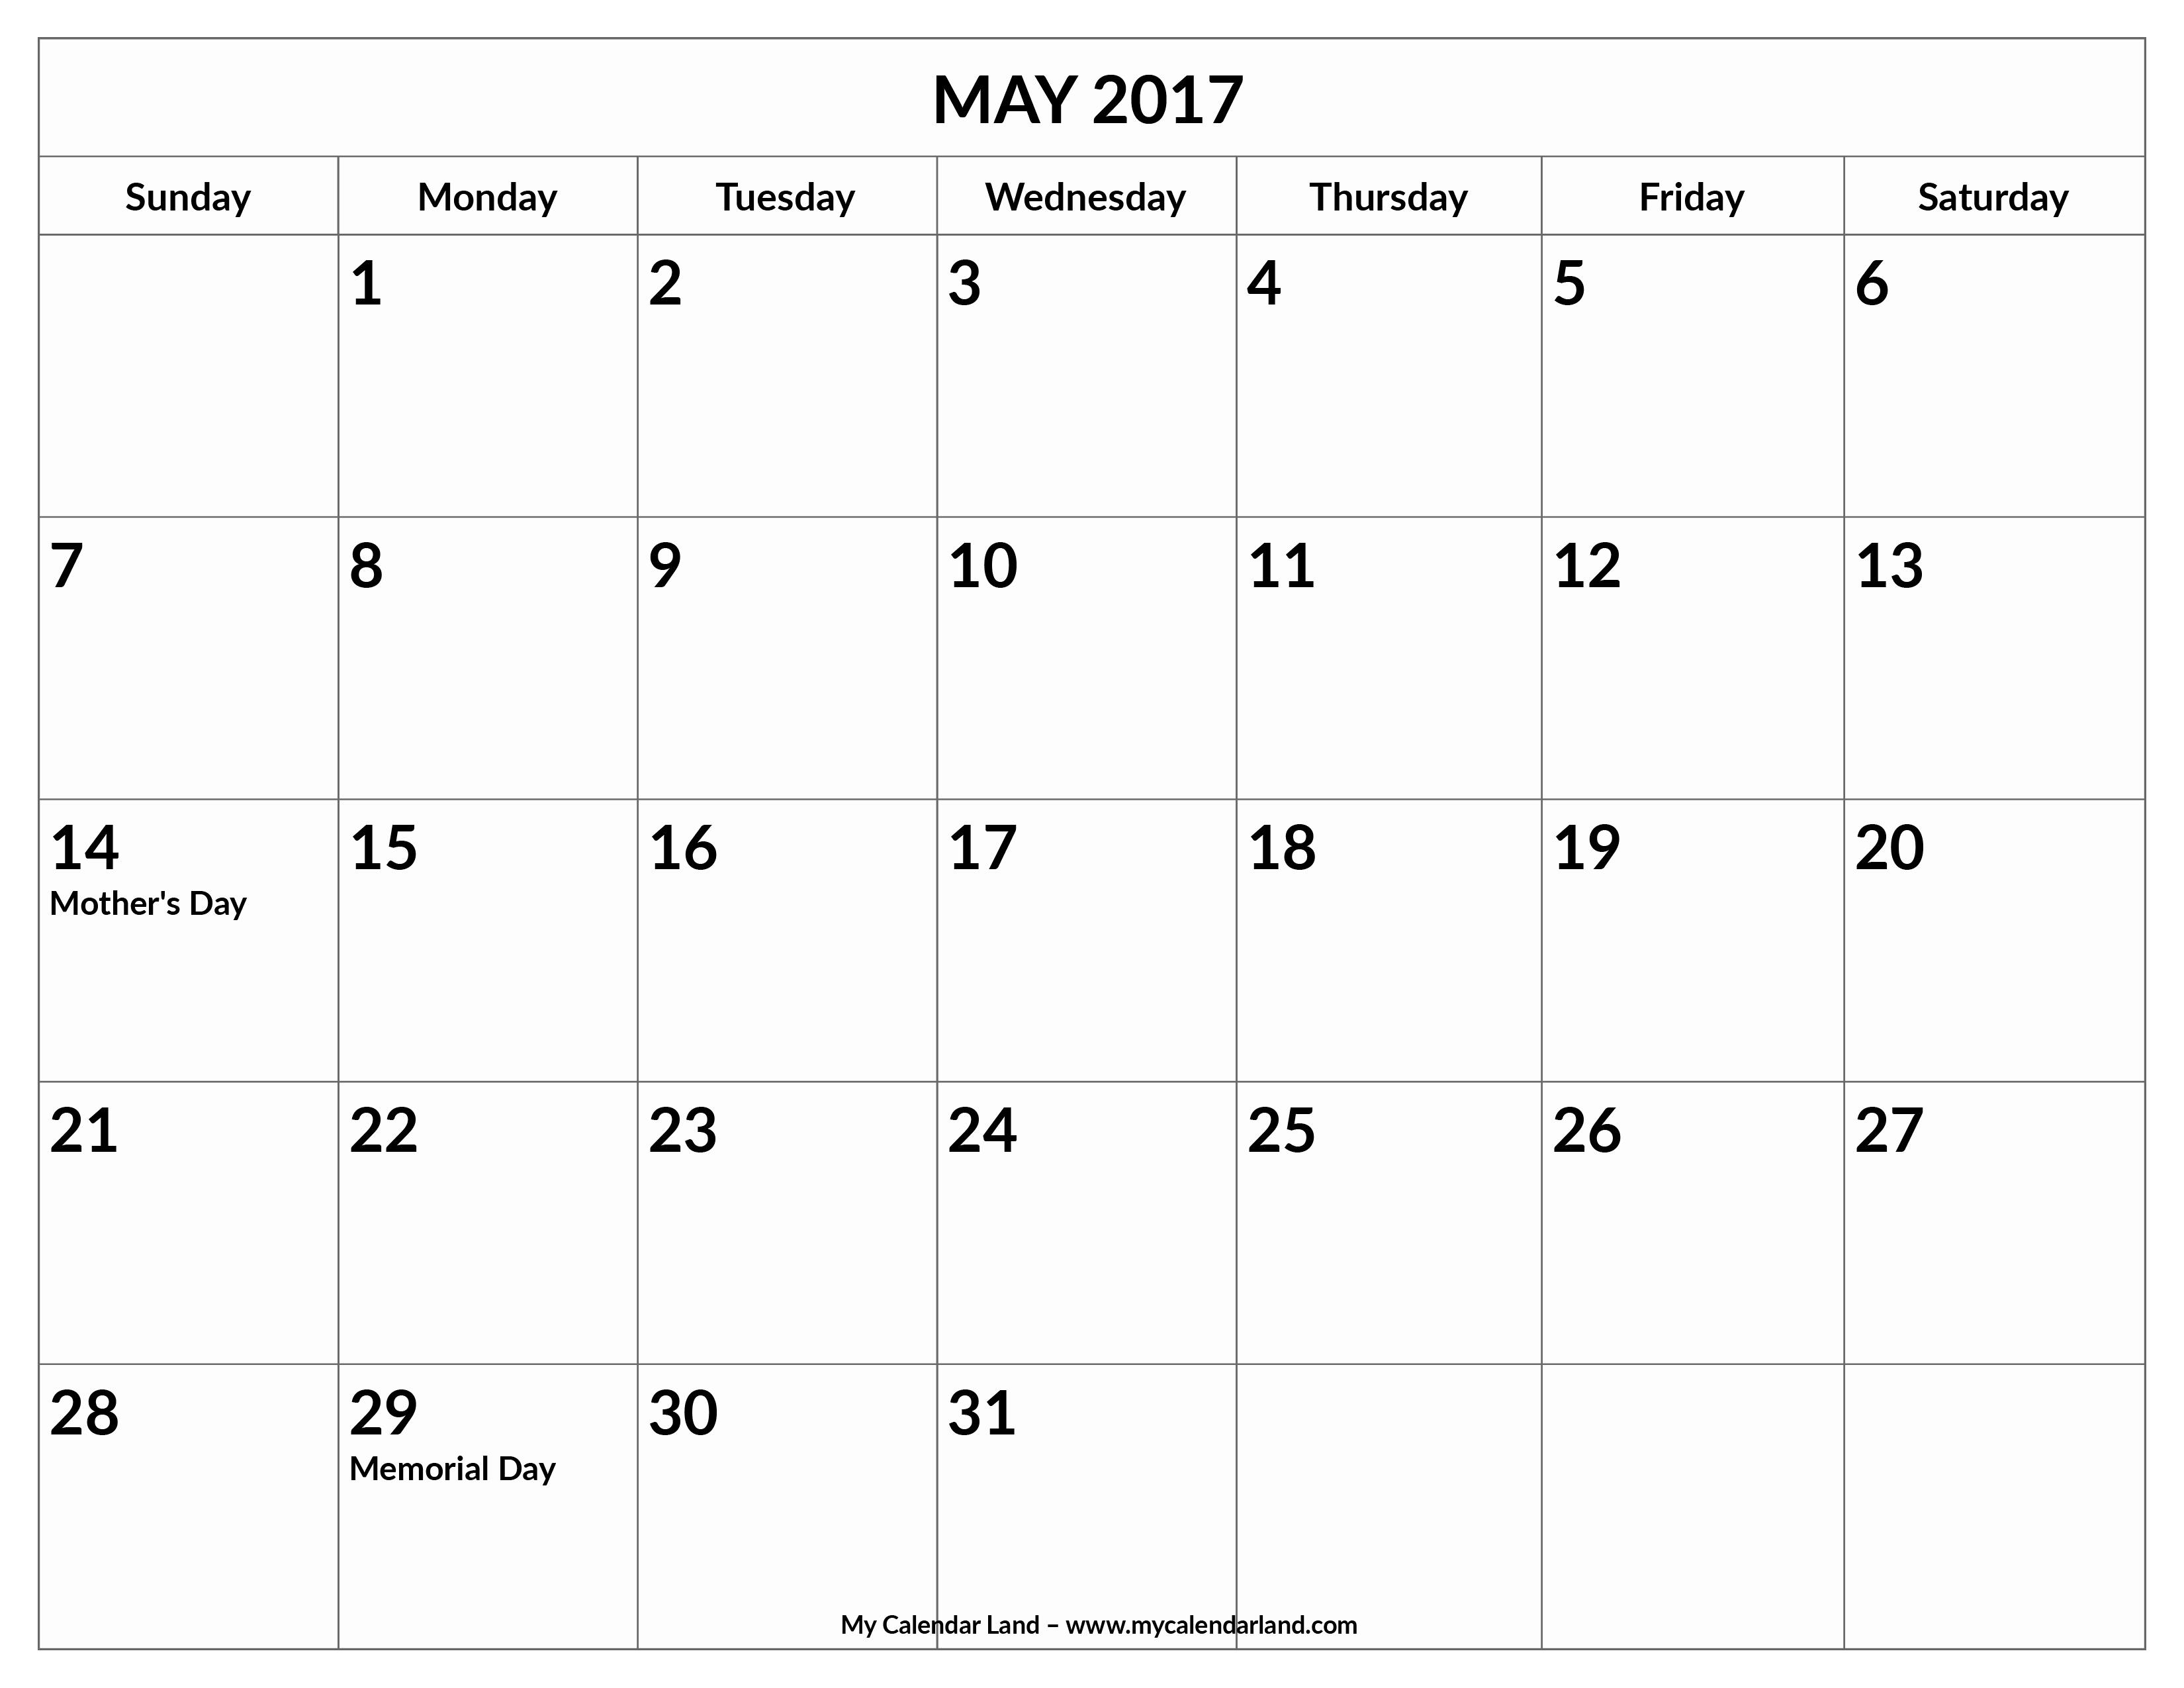 Blank May Calendar 2017 Printable Unique May 2017 Calendar My Calendar Land